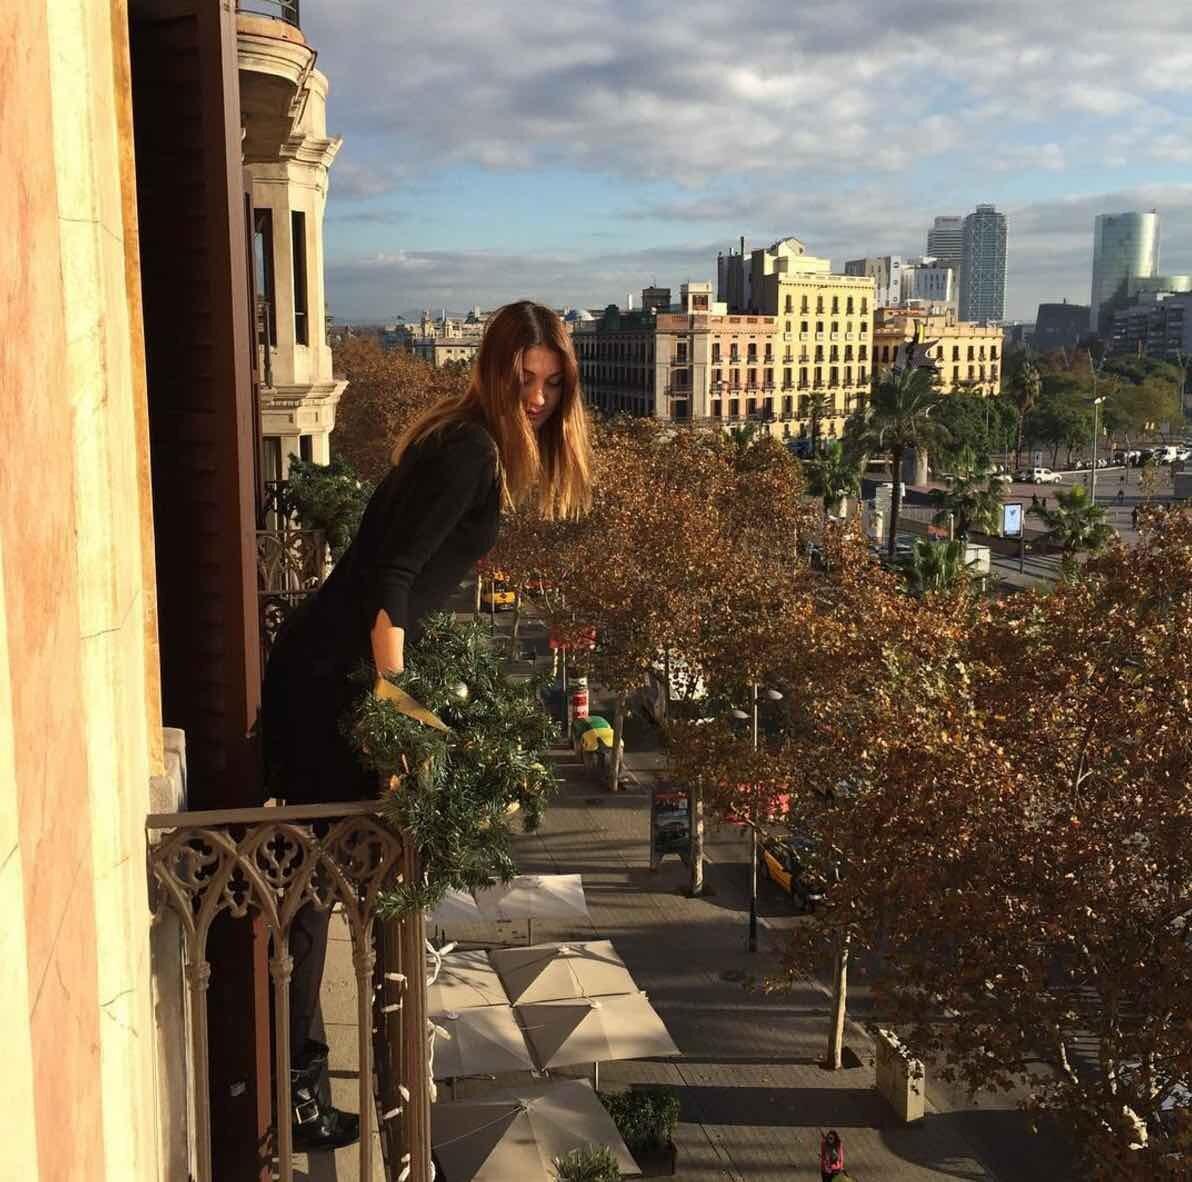 @maria_flordecorbcn in Barcelona